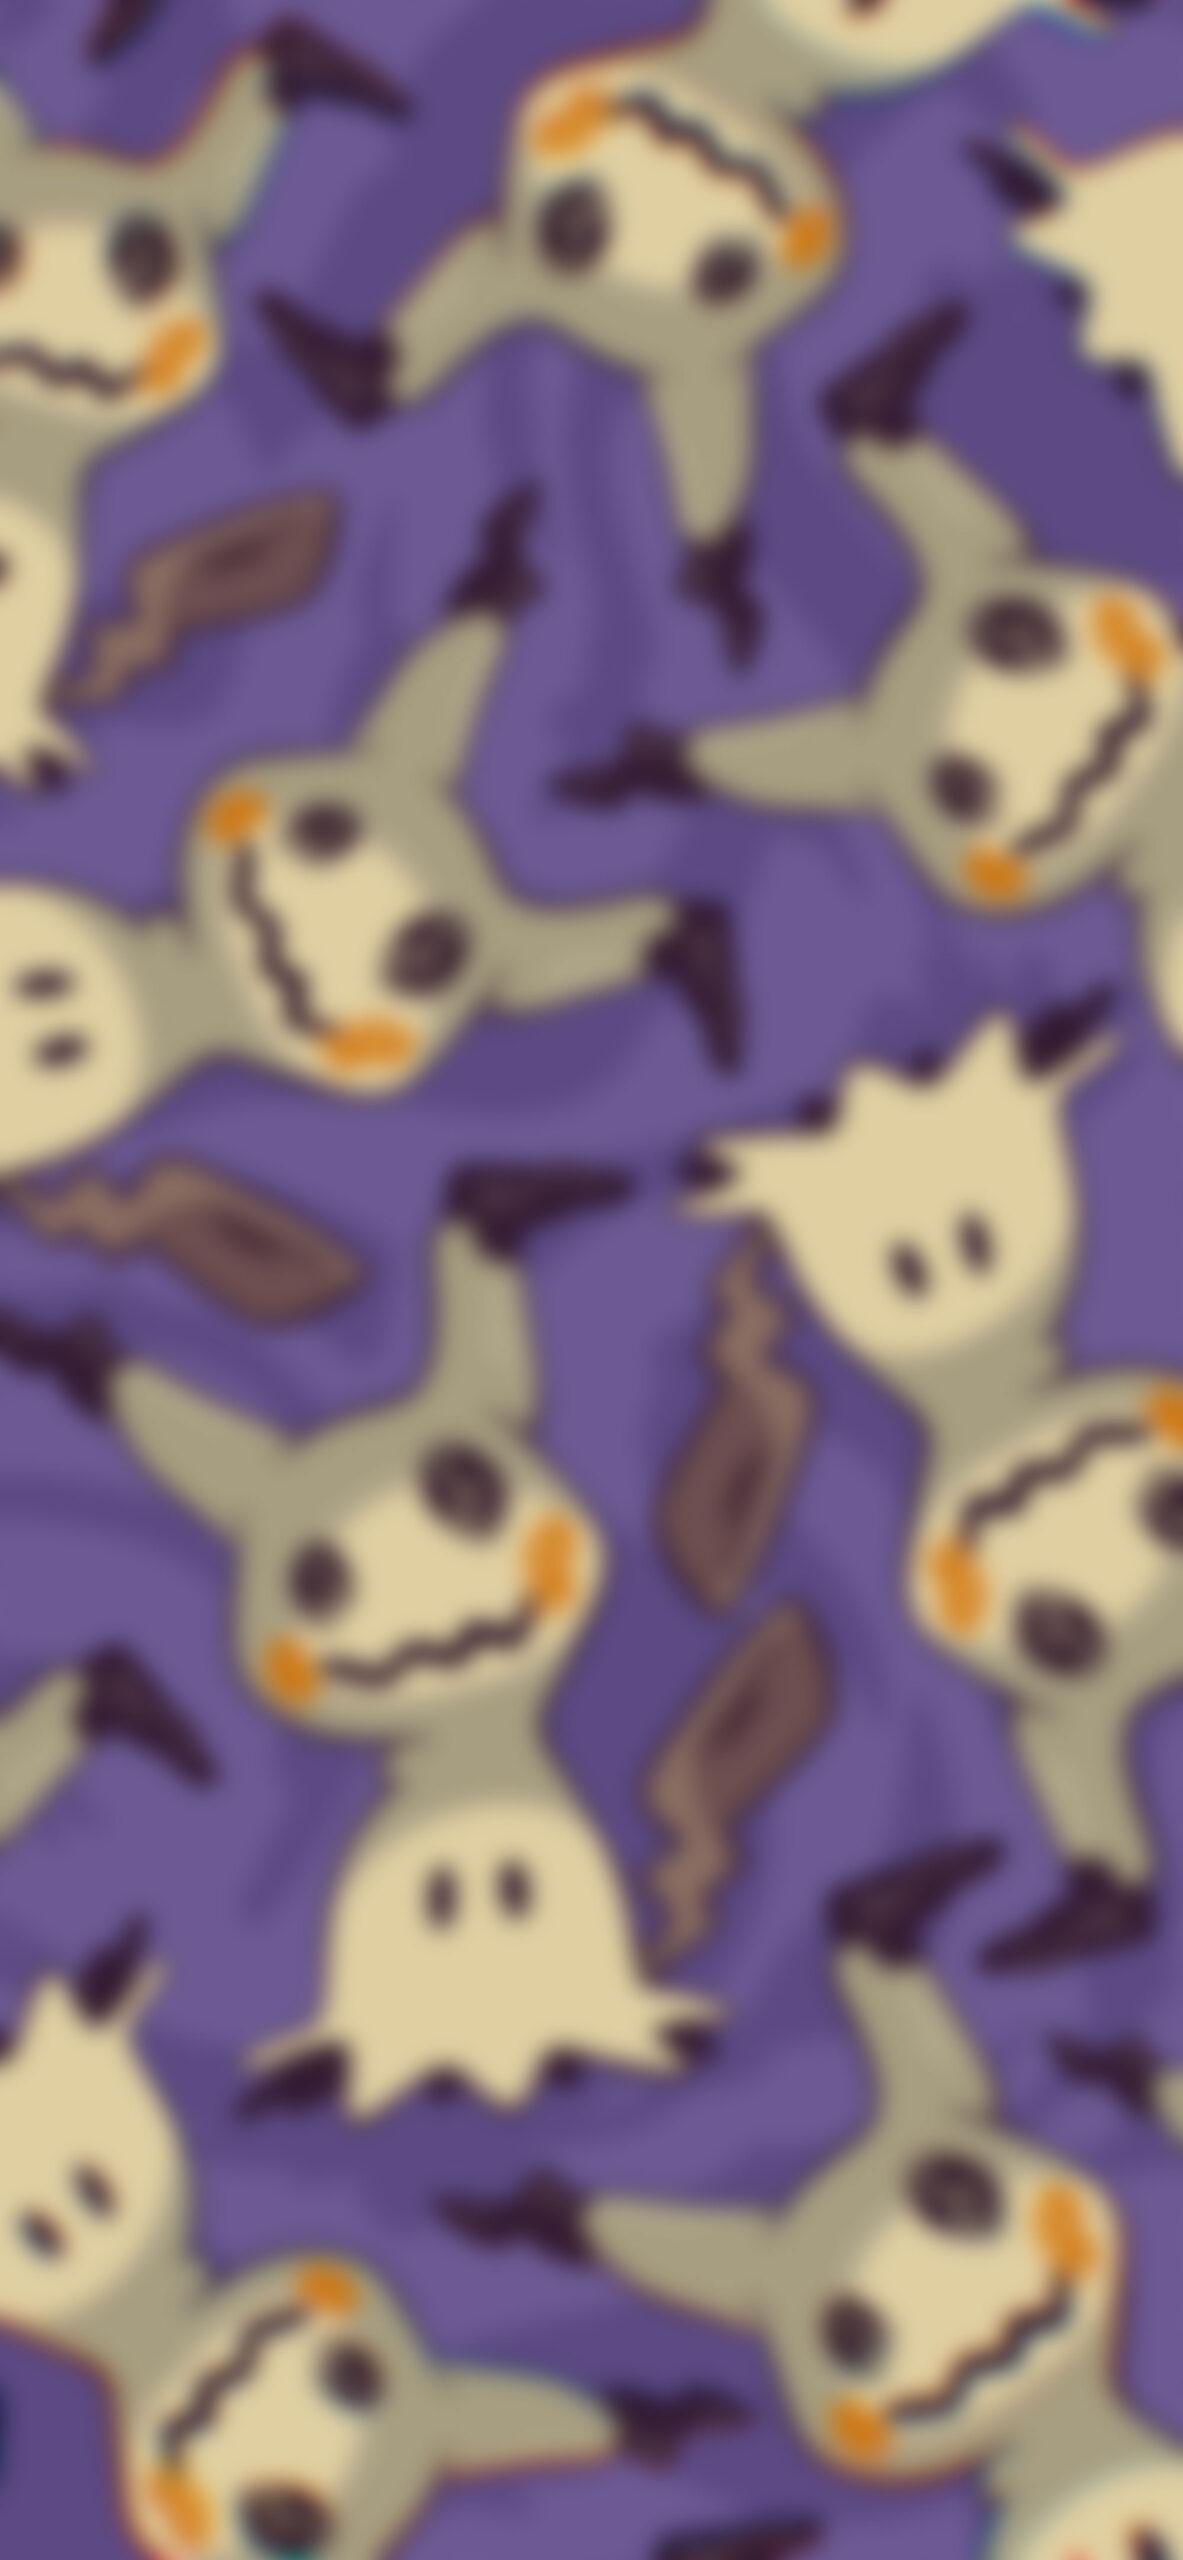 pokemon mimikyu purple blur wallpaper